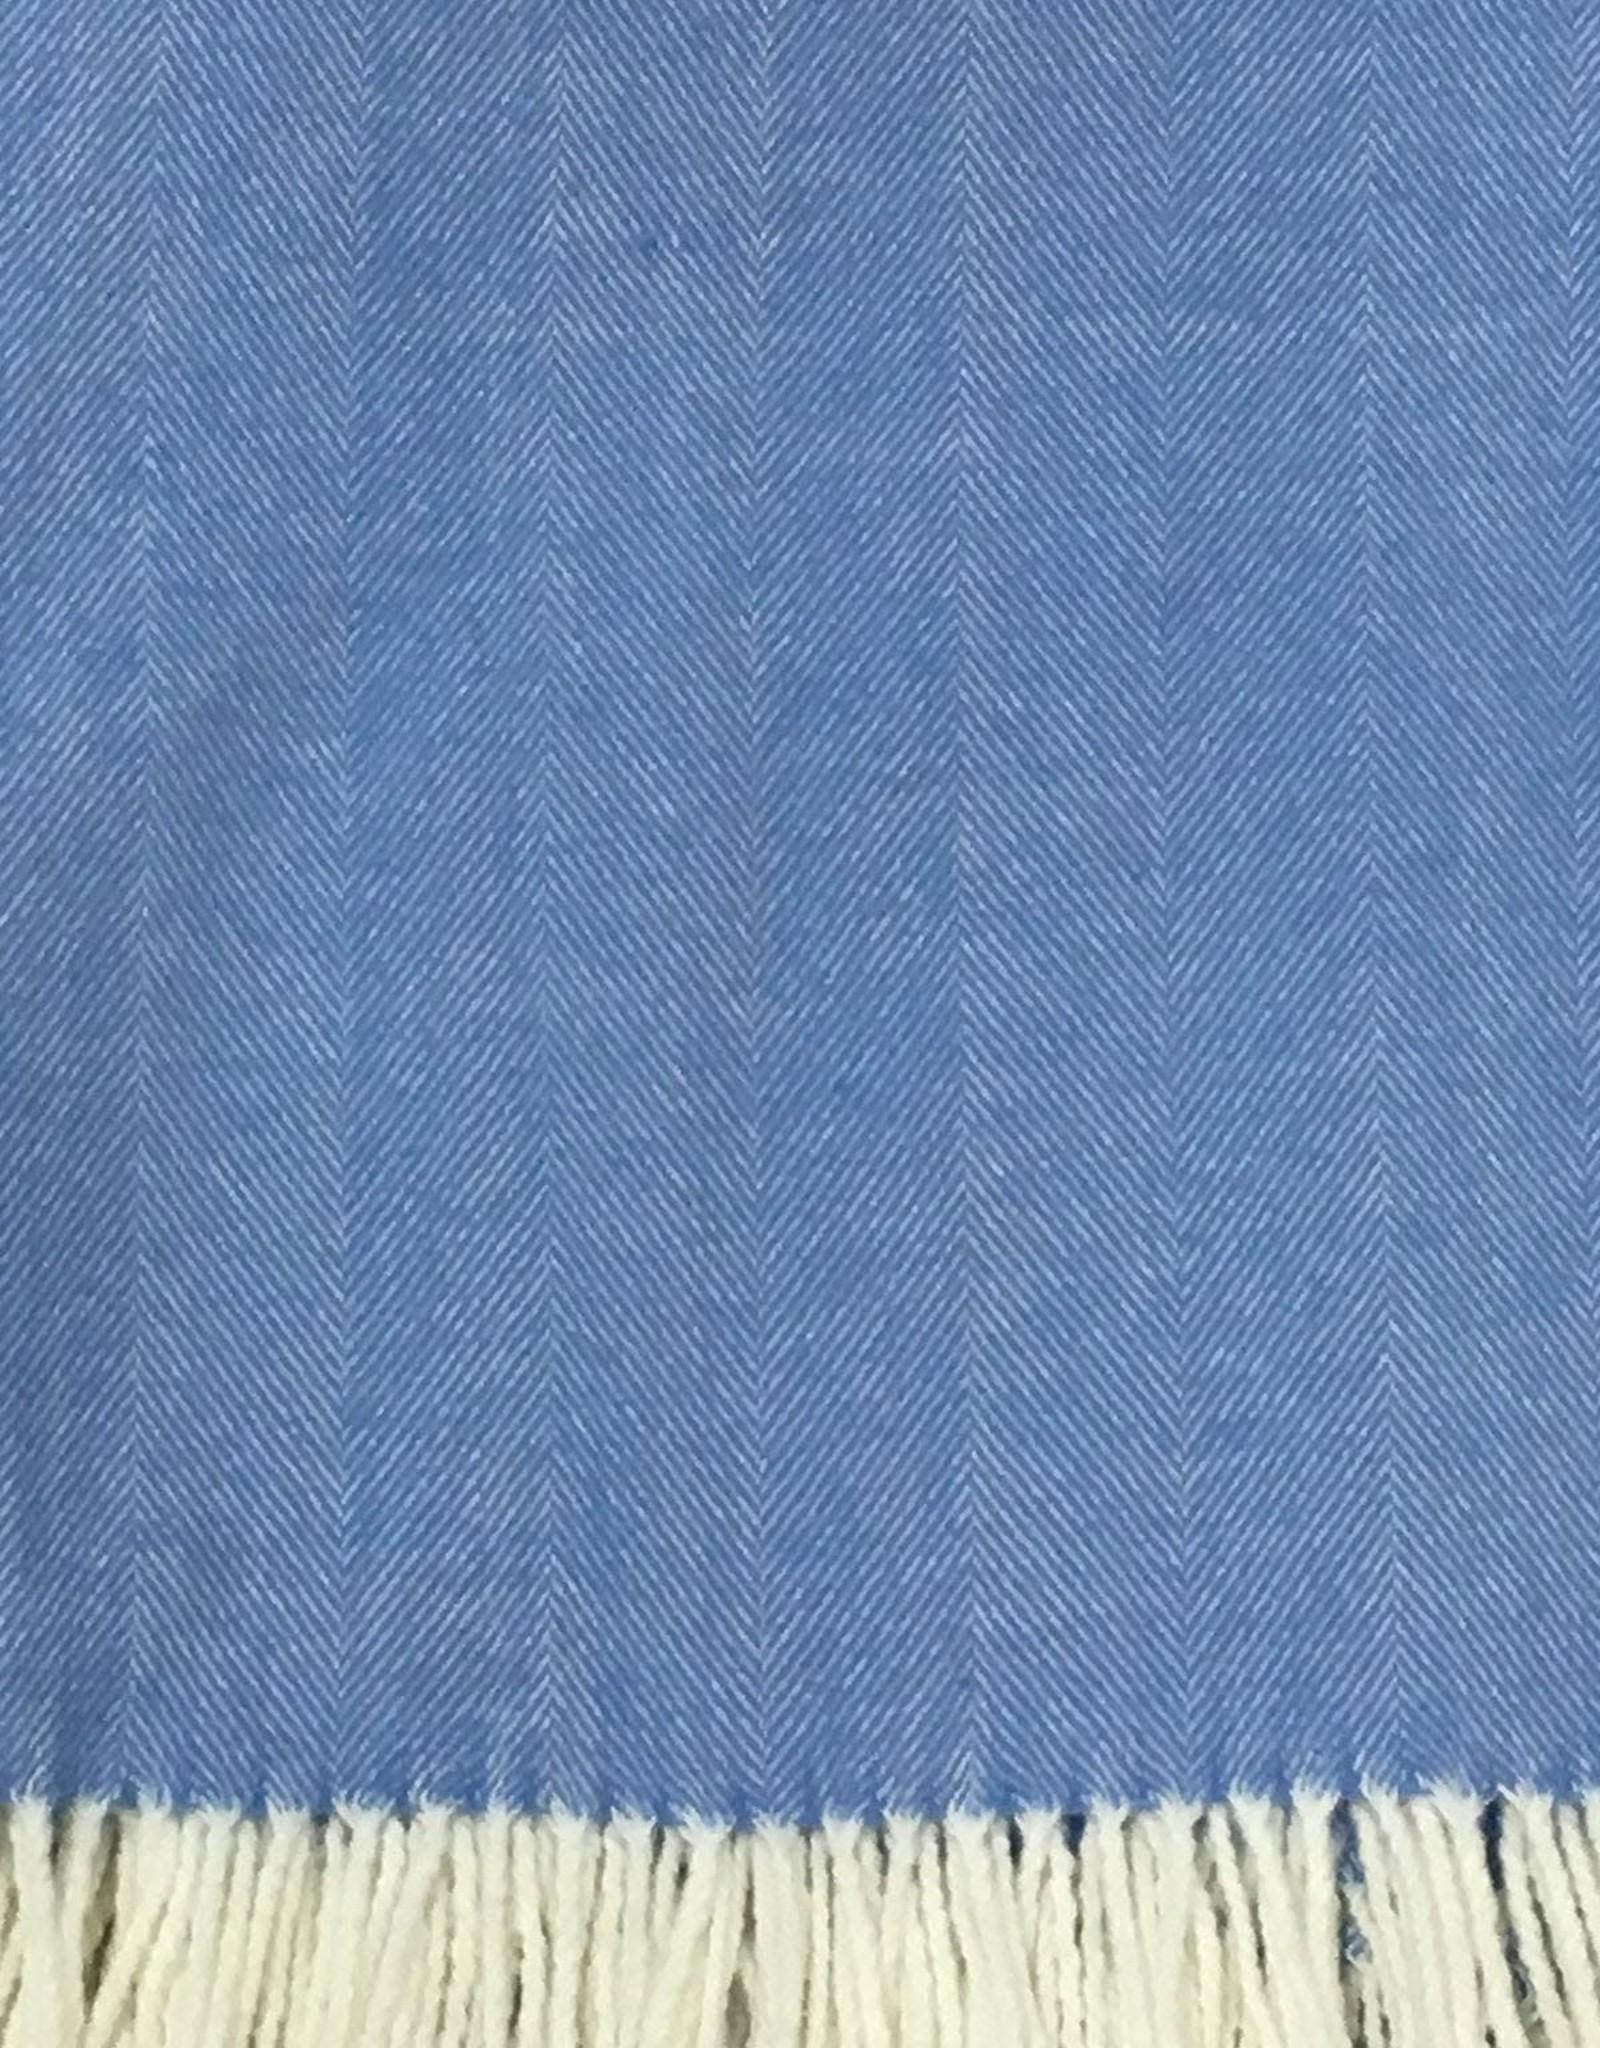 Alashan Cashmere Co. Herringbone Throw Carolina Blue